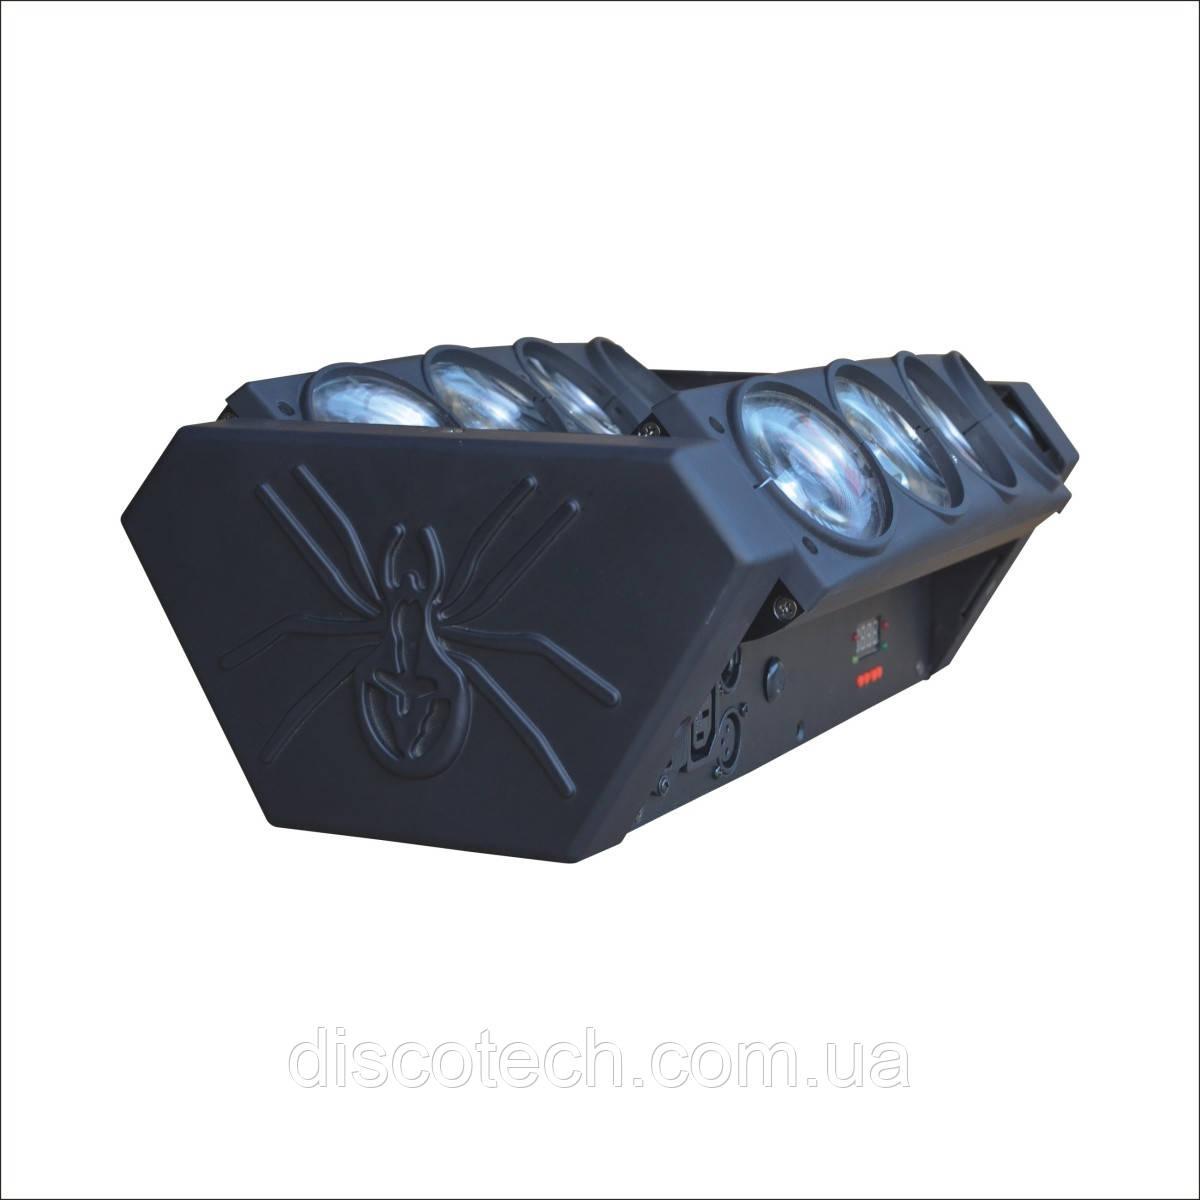 Дискоэффект LED SPIDER 810